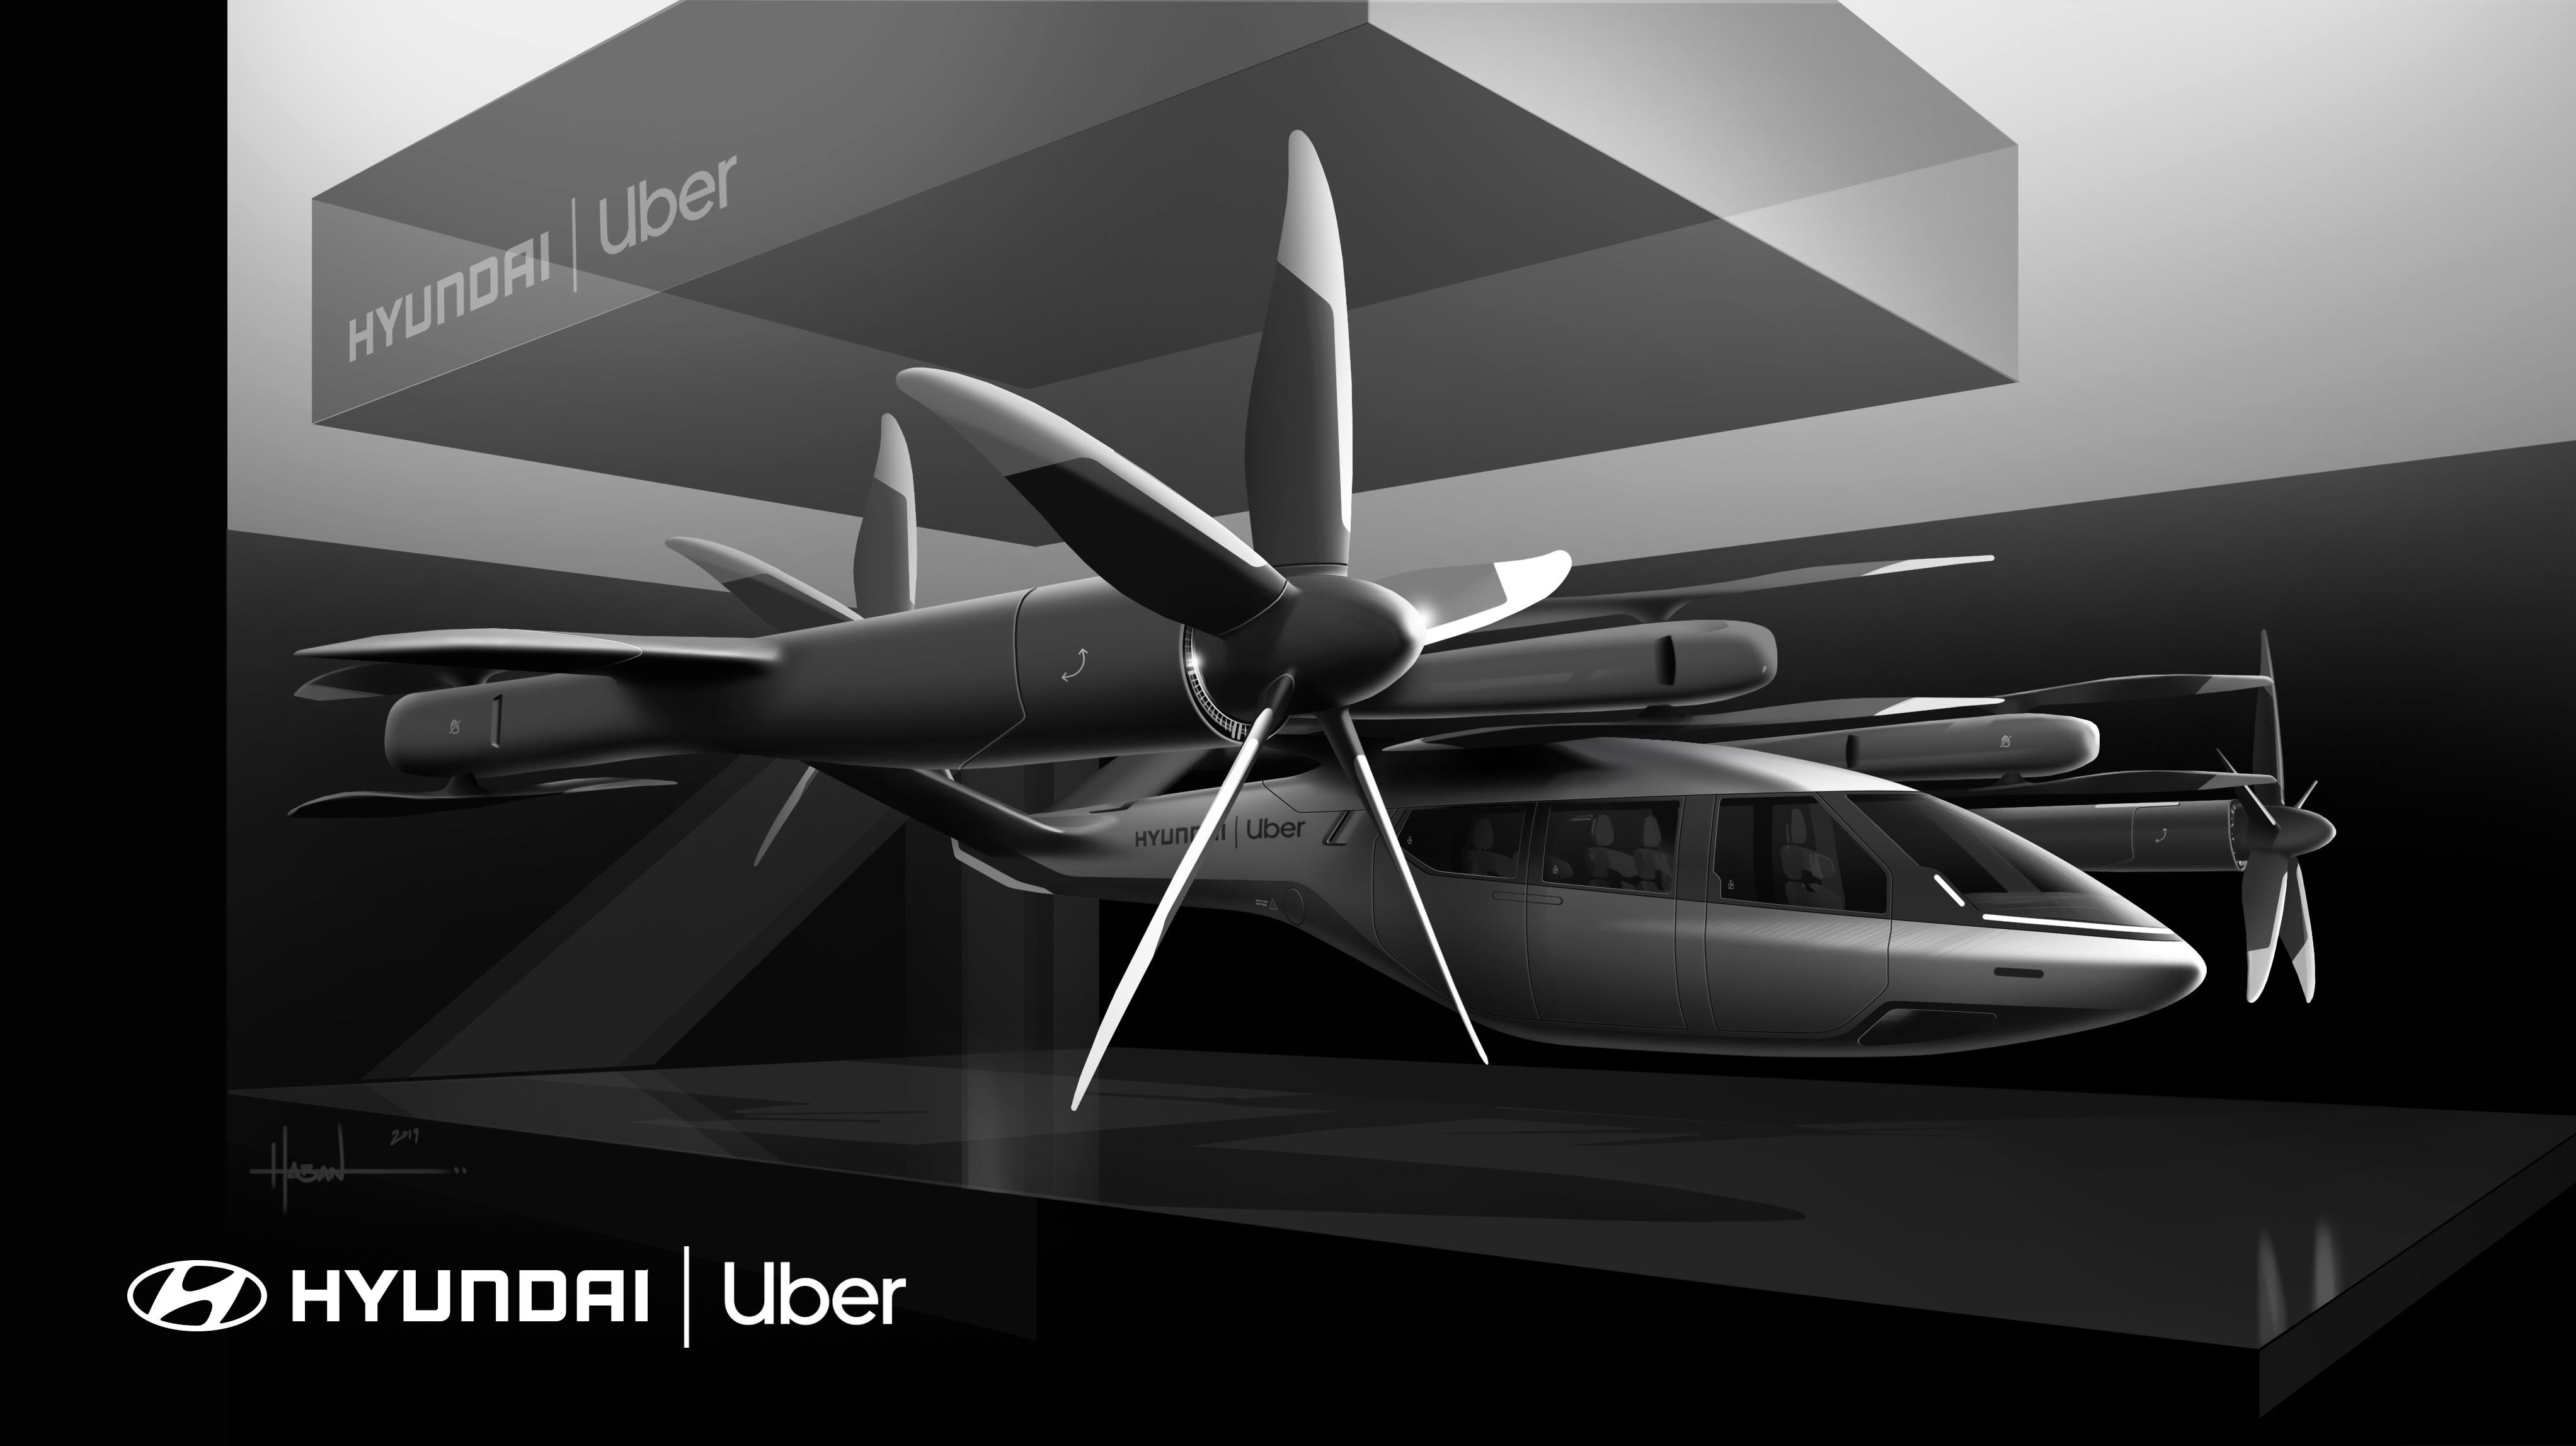 Hyundai – Uber – Transporte Aereo (2)